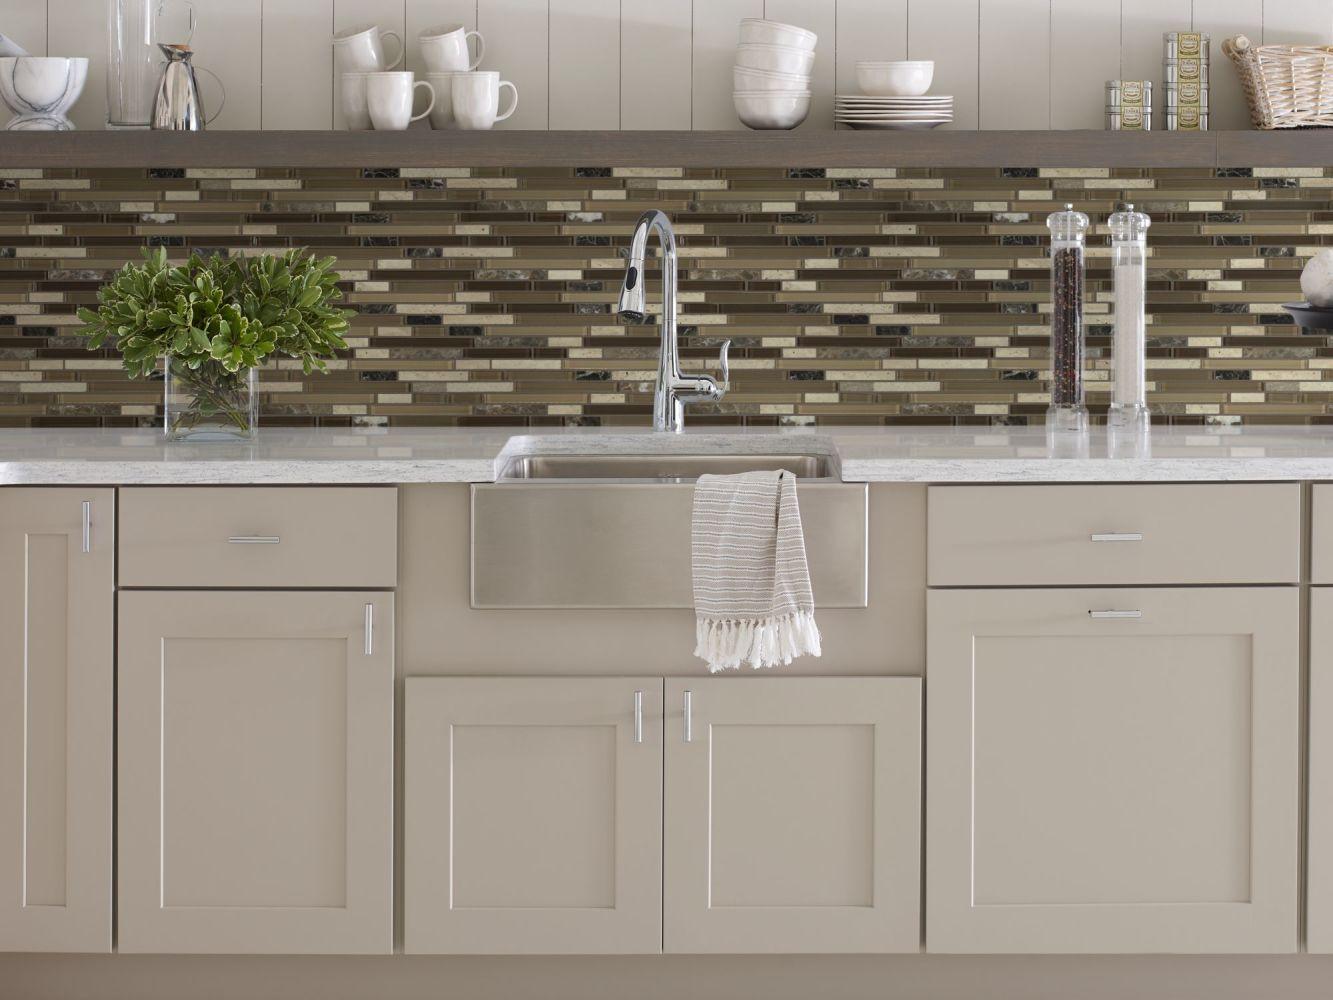 Shaw Floors Home Fn Gold Ceramic Awesome Mix Random Linear Mosi Cappuccino 00700_TG63B